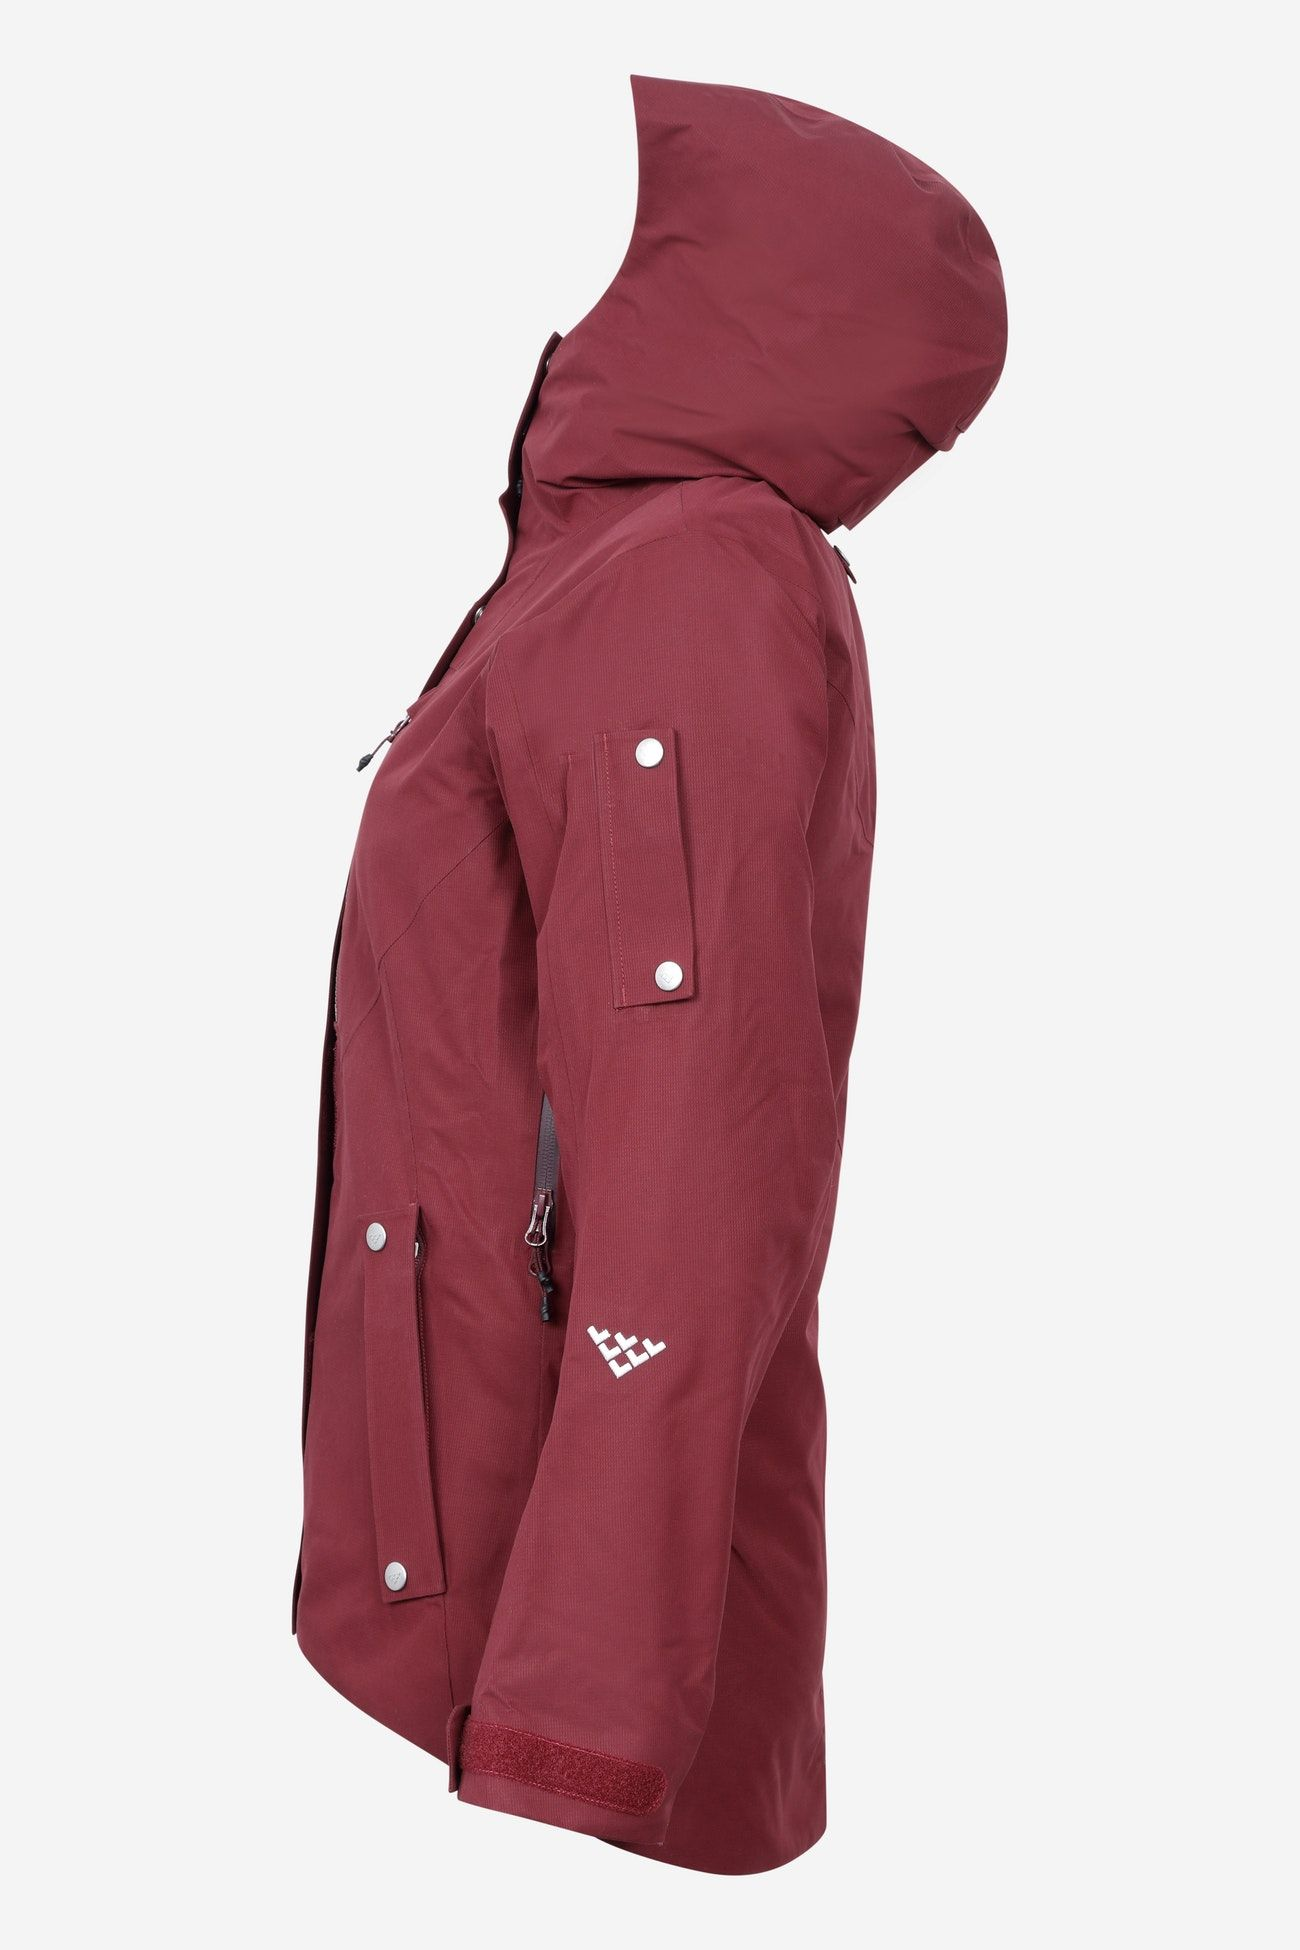 c78baa2f84e89 Corpus Insulated Gore-tex® Jacket | Black Crows Gore Tex Jacket, Rain Jacket